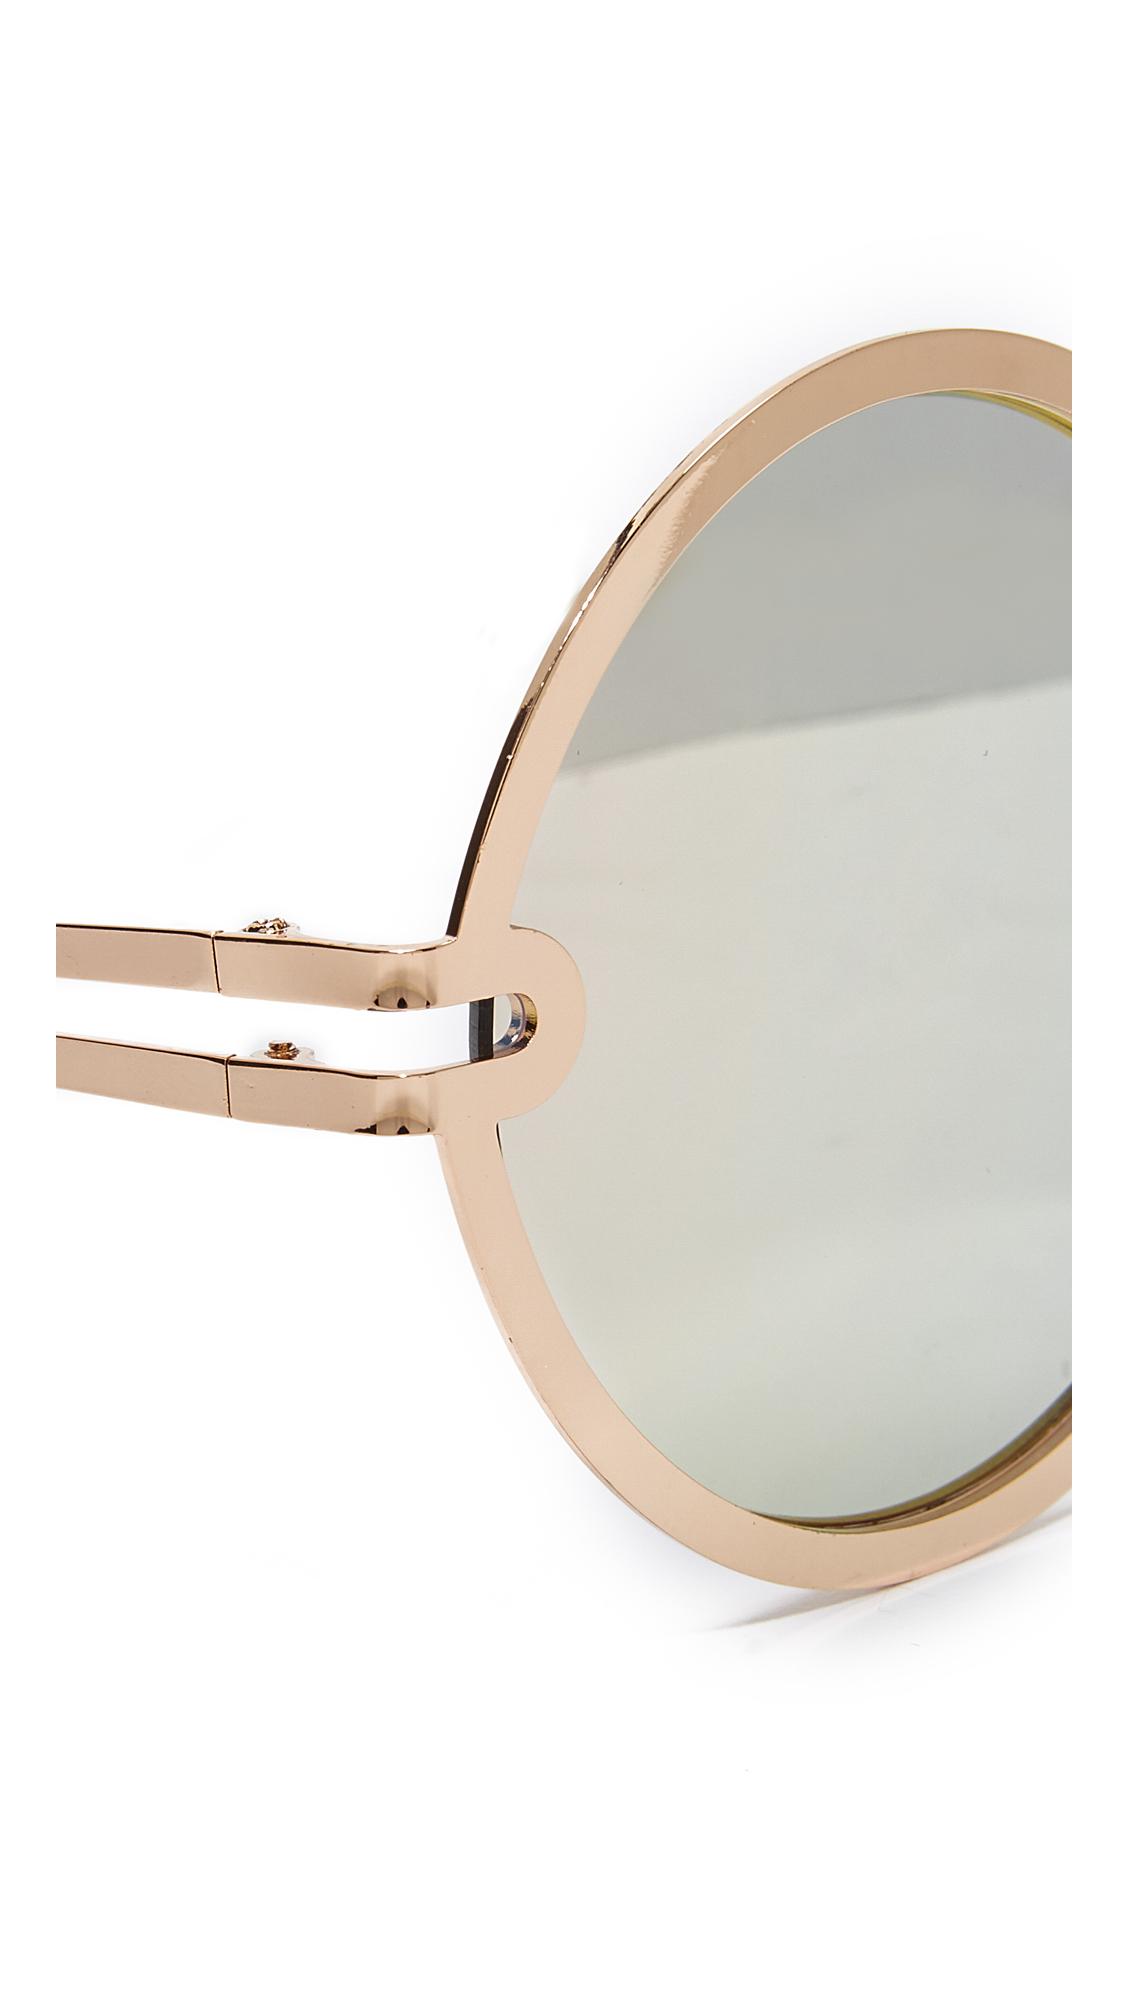 82868ad624f99 Quay Ukiyo Sunglasses